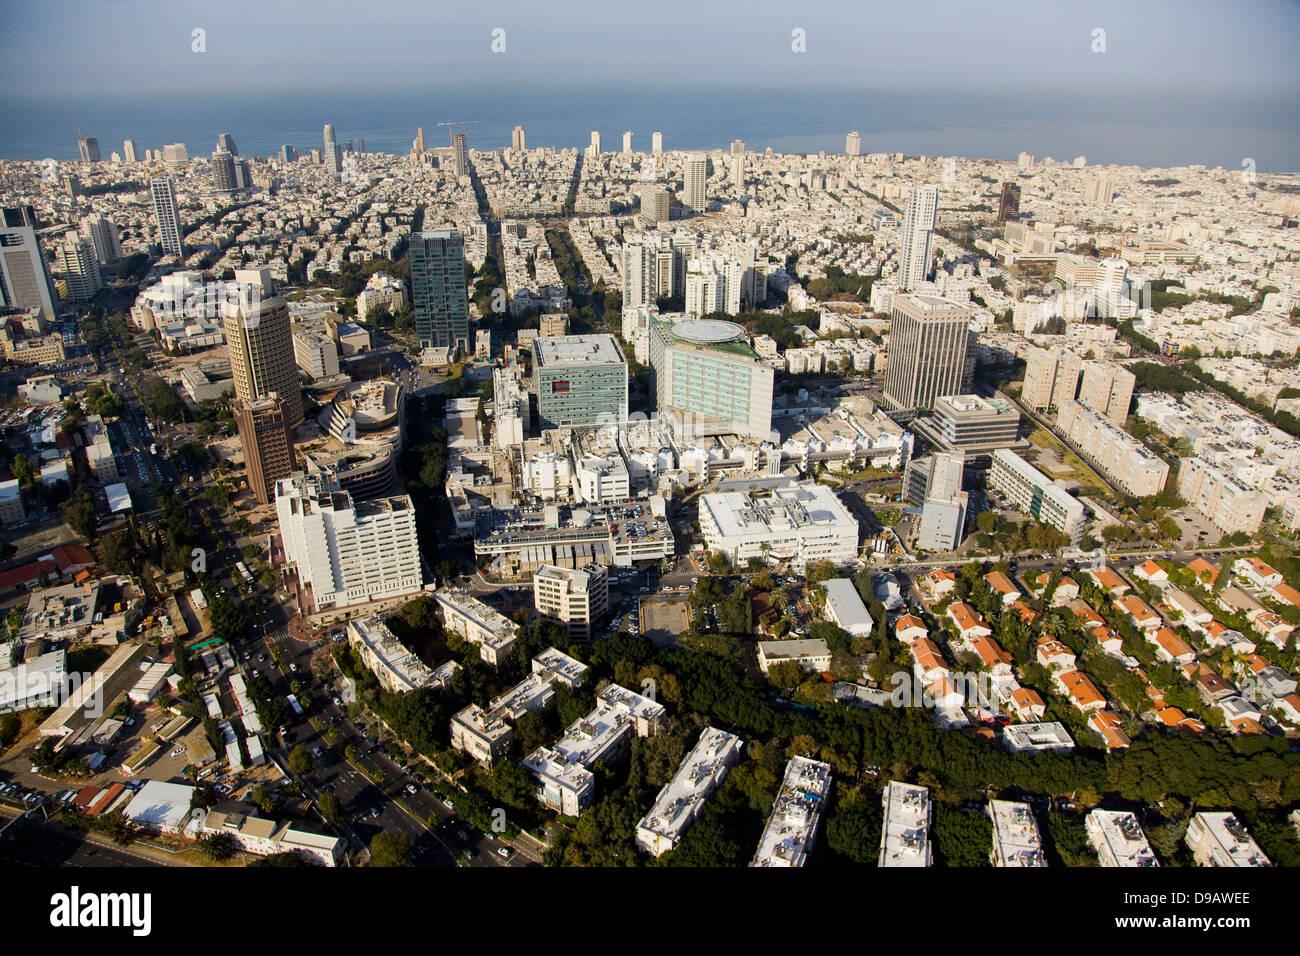 An aerial photo of Tel Aviv citycenter Stock Photo